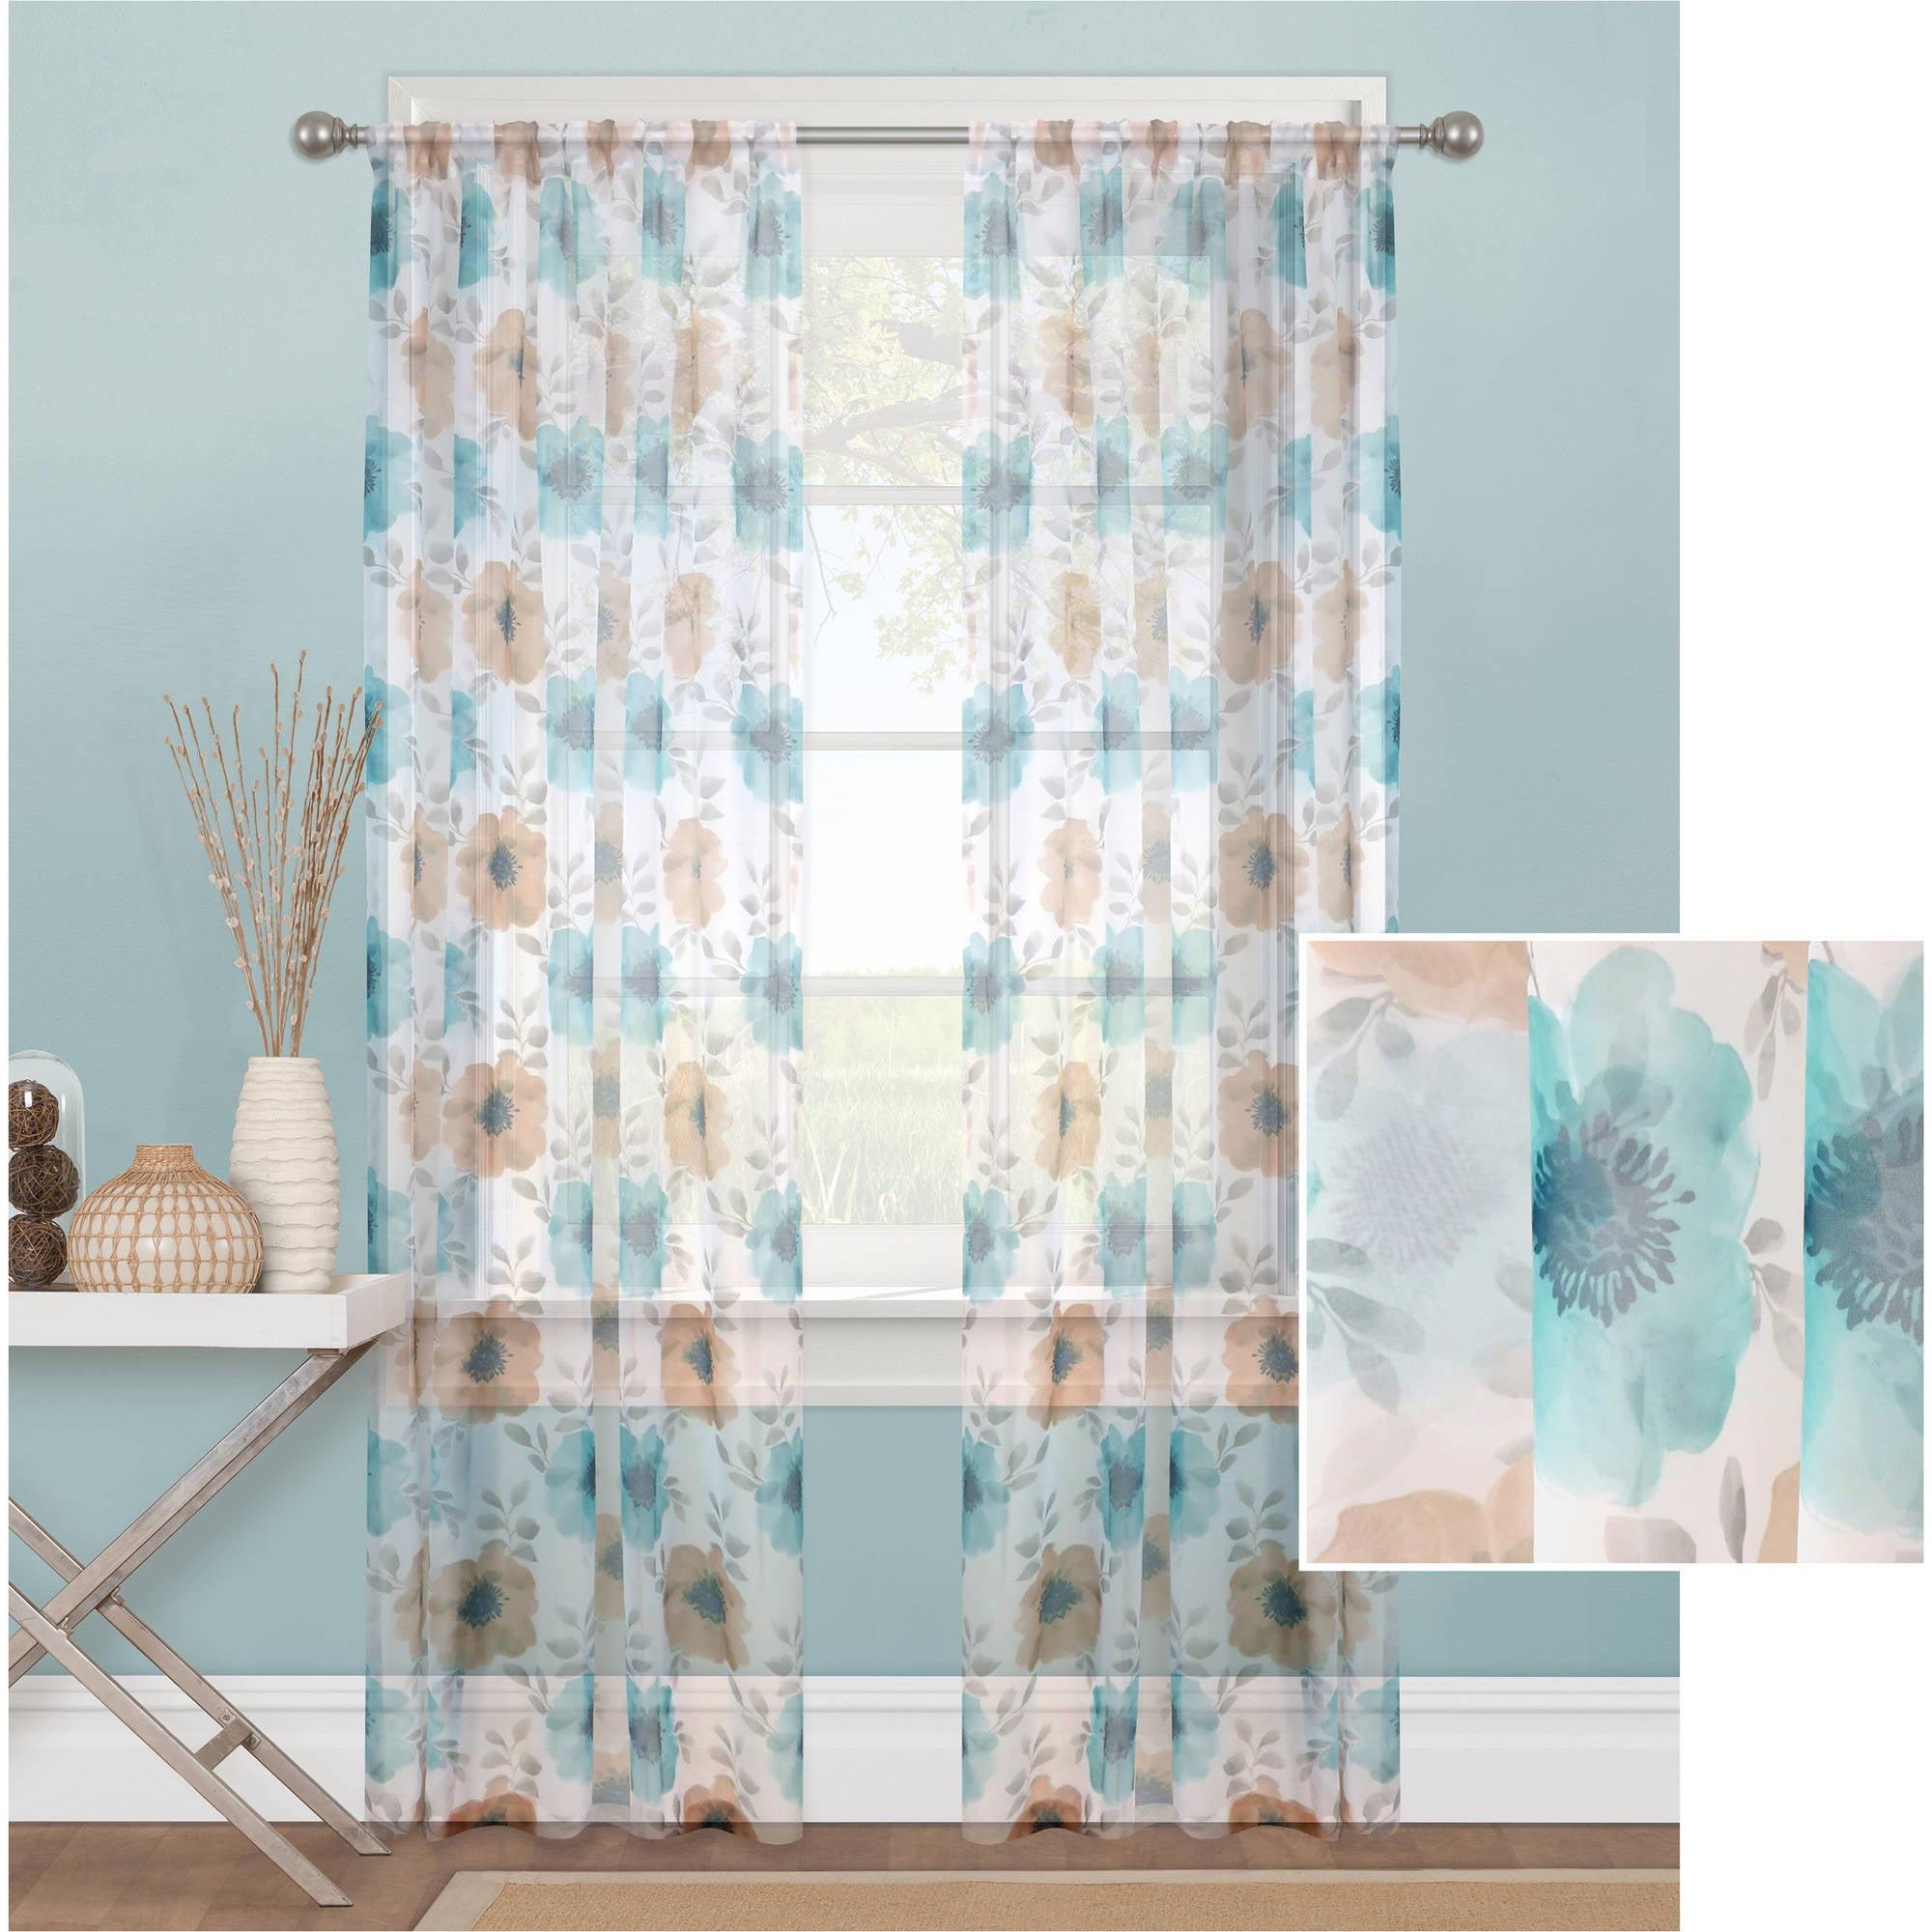 Mainstays Sheer Blossom Window Curtain Panel